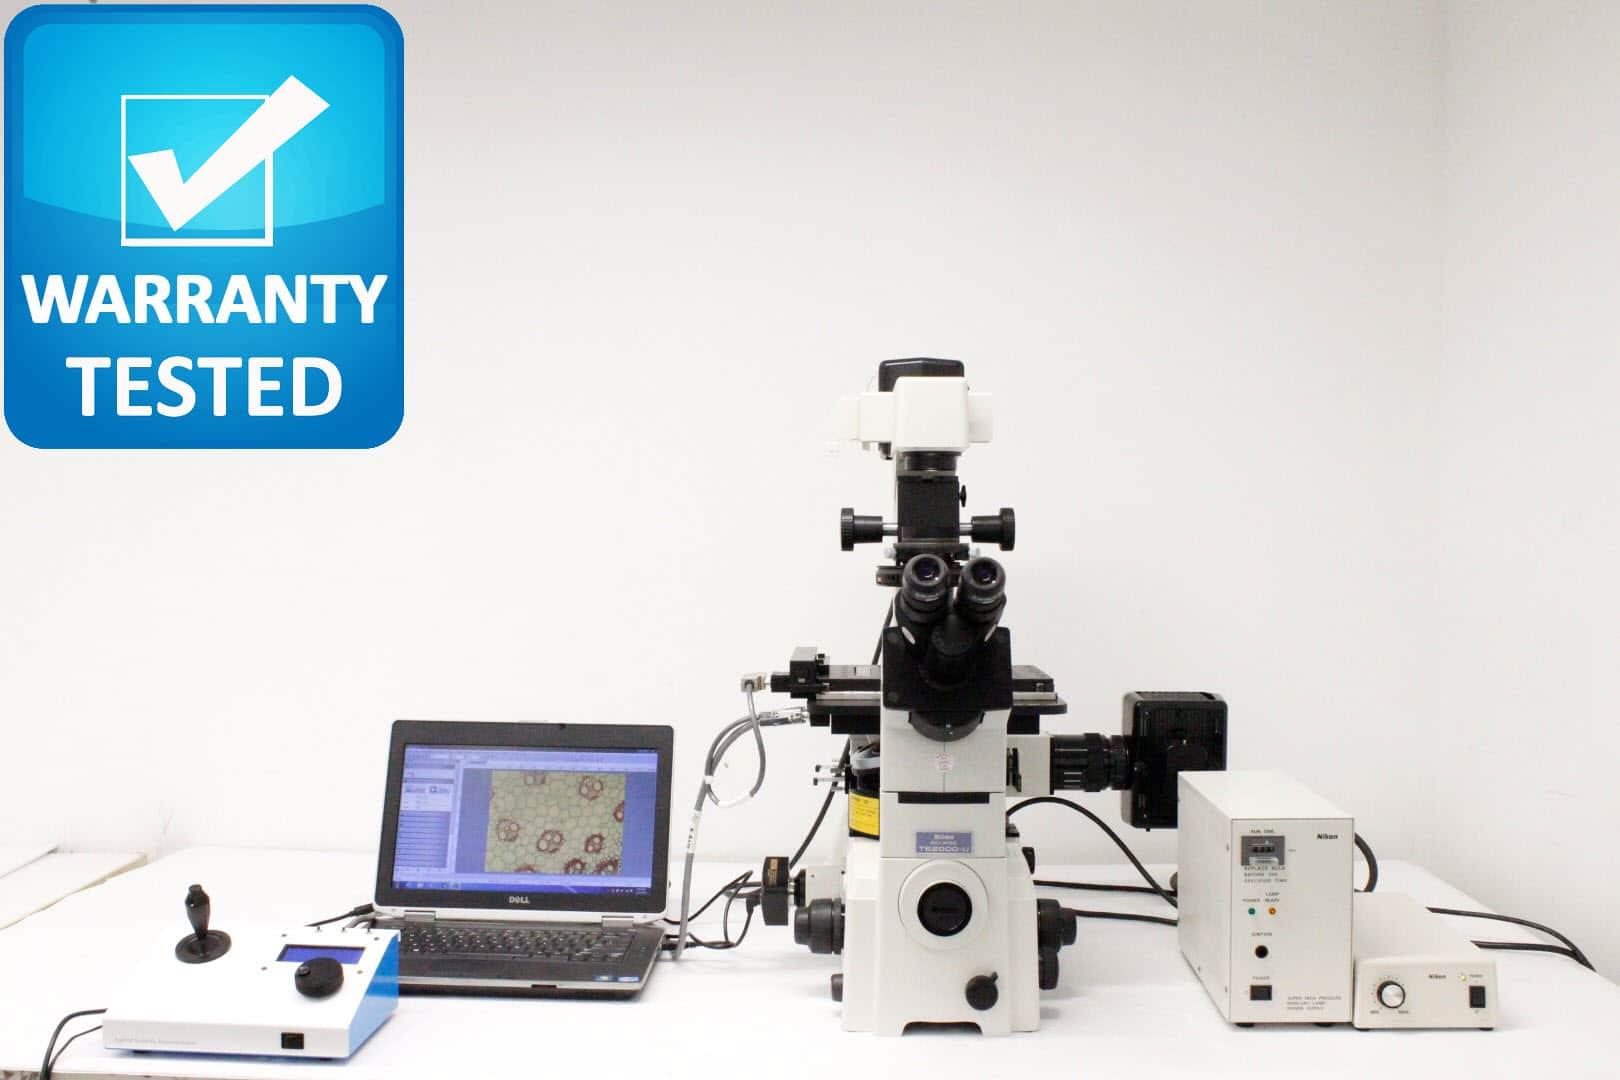 Nikon TE2000-U Inverted Microscope